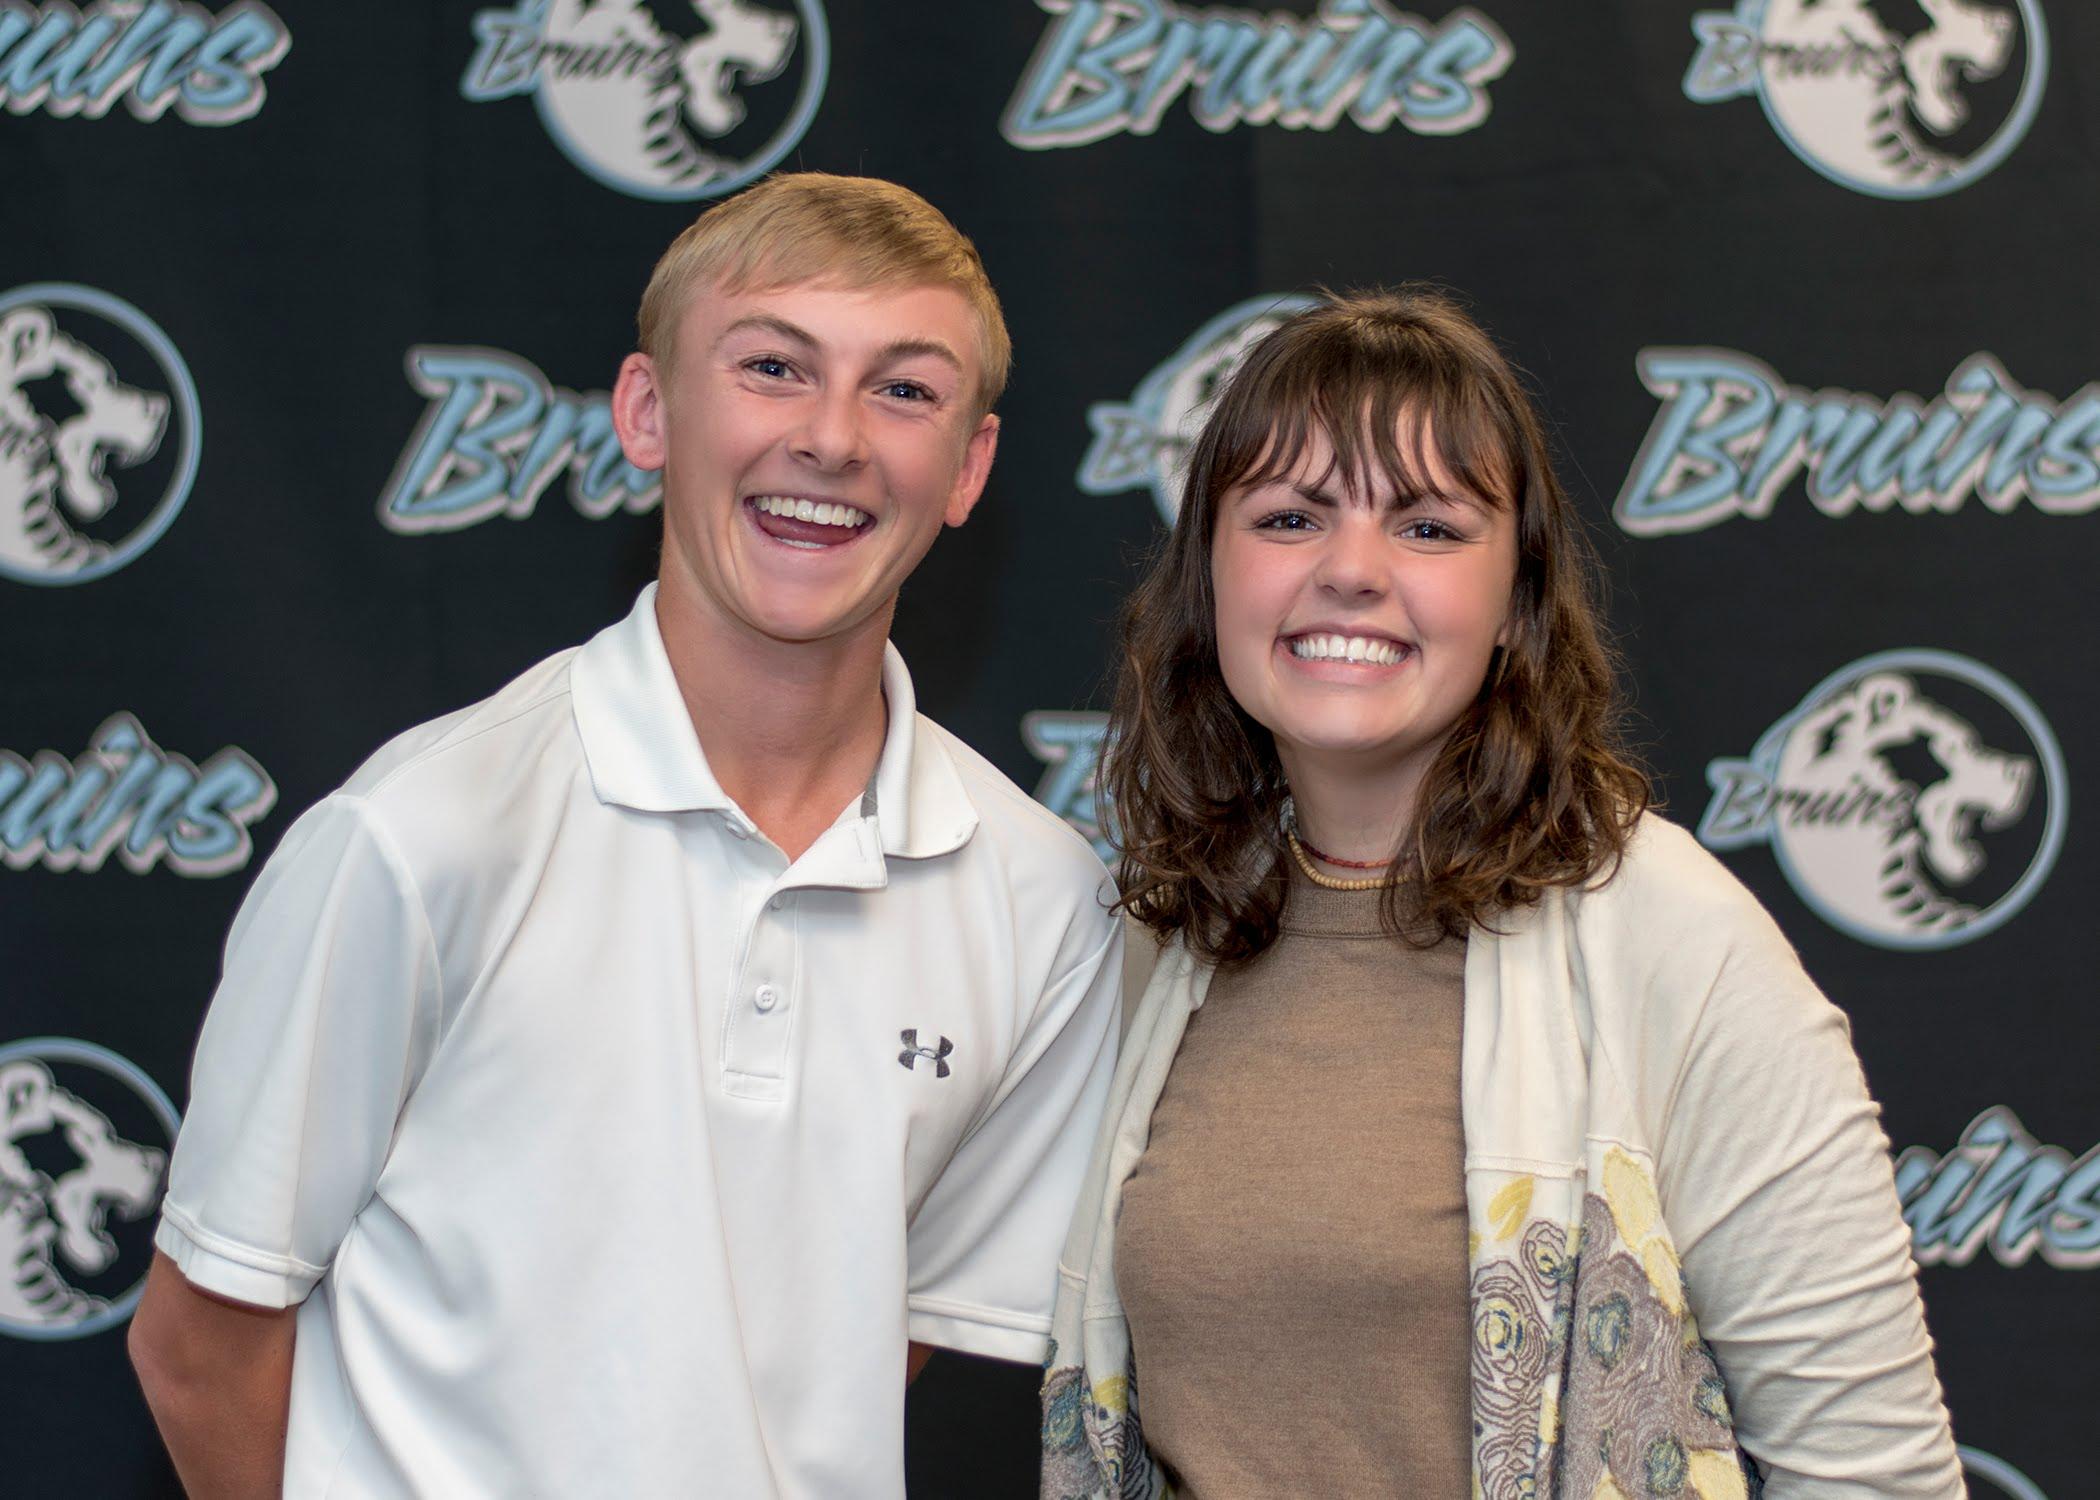 Matt Russell (Senior), Hannah Aldrich (Senior) Principal's Students of the Month for September